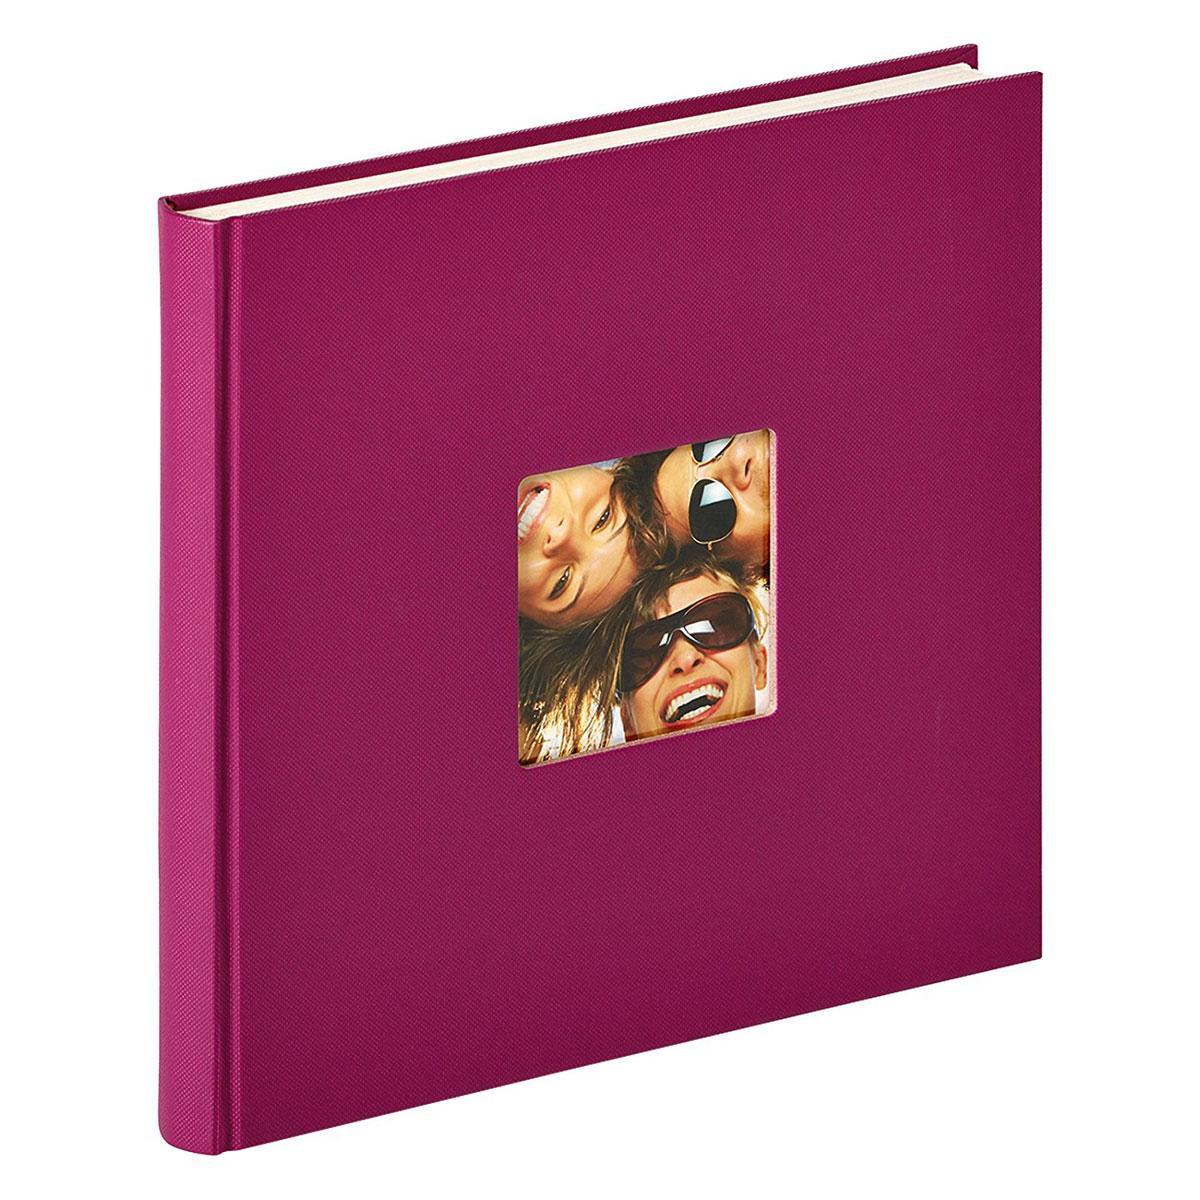 Альбом Walther 26*25 Fun FA-205-Y violet 40 pages